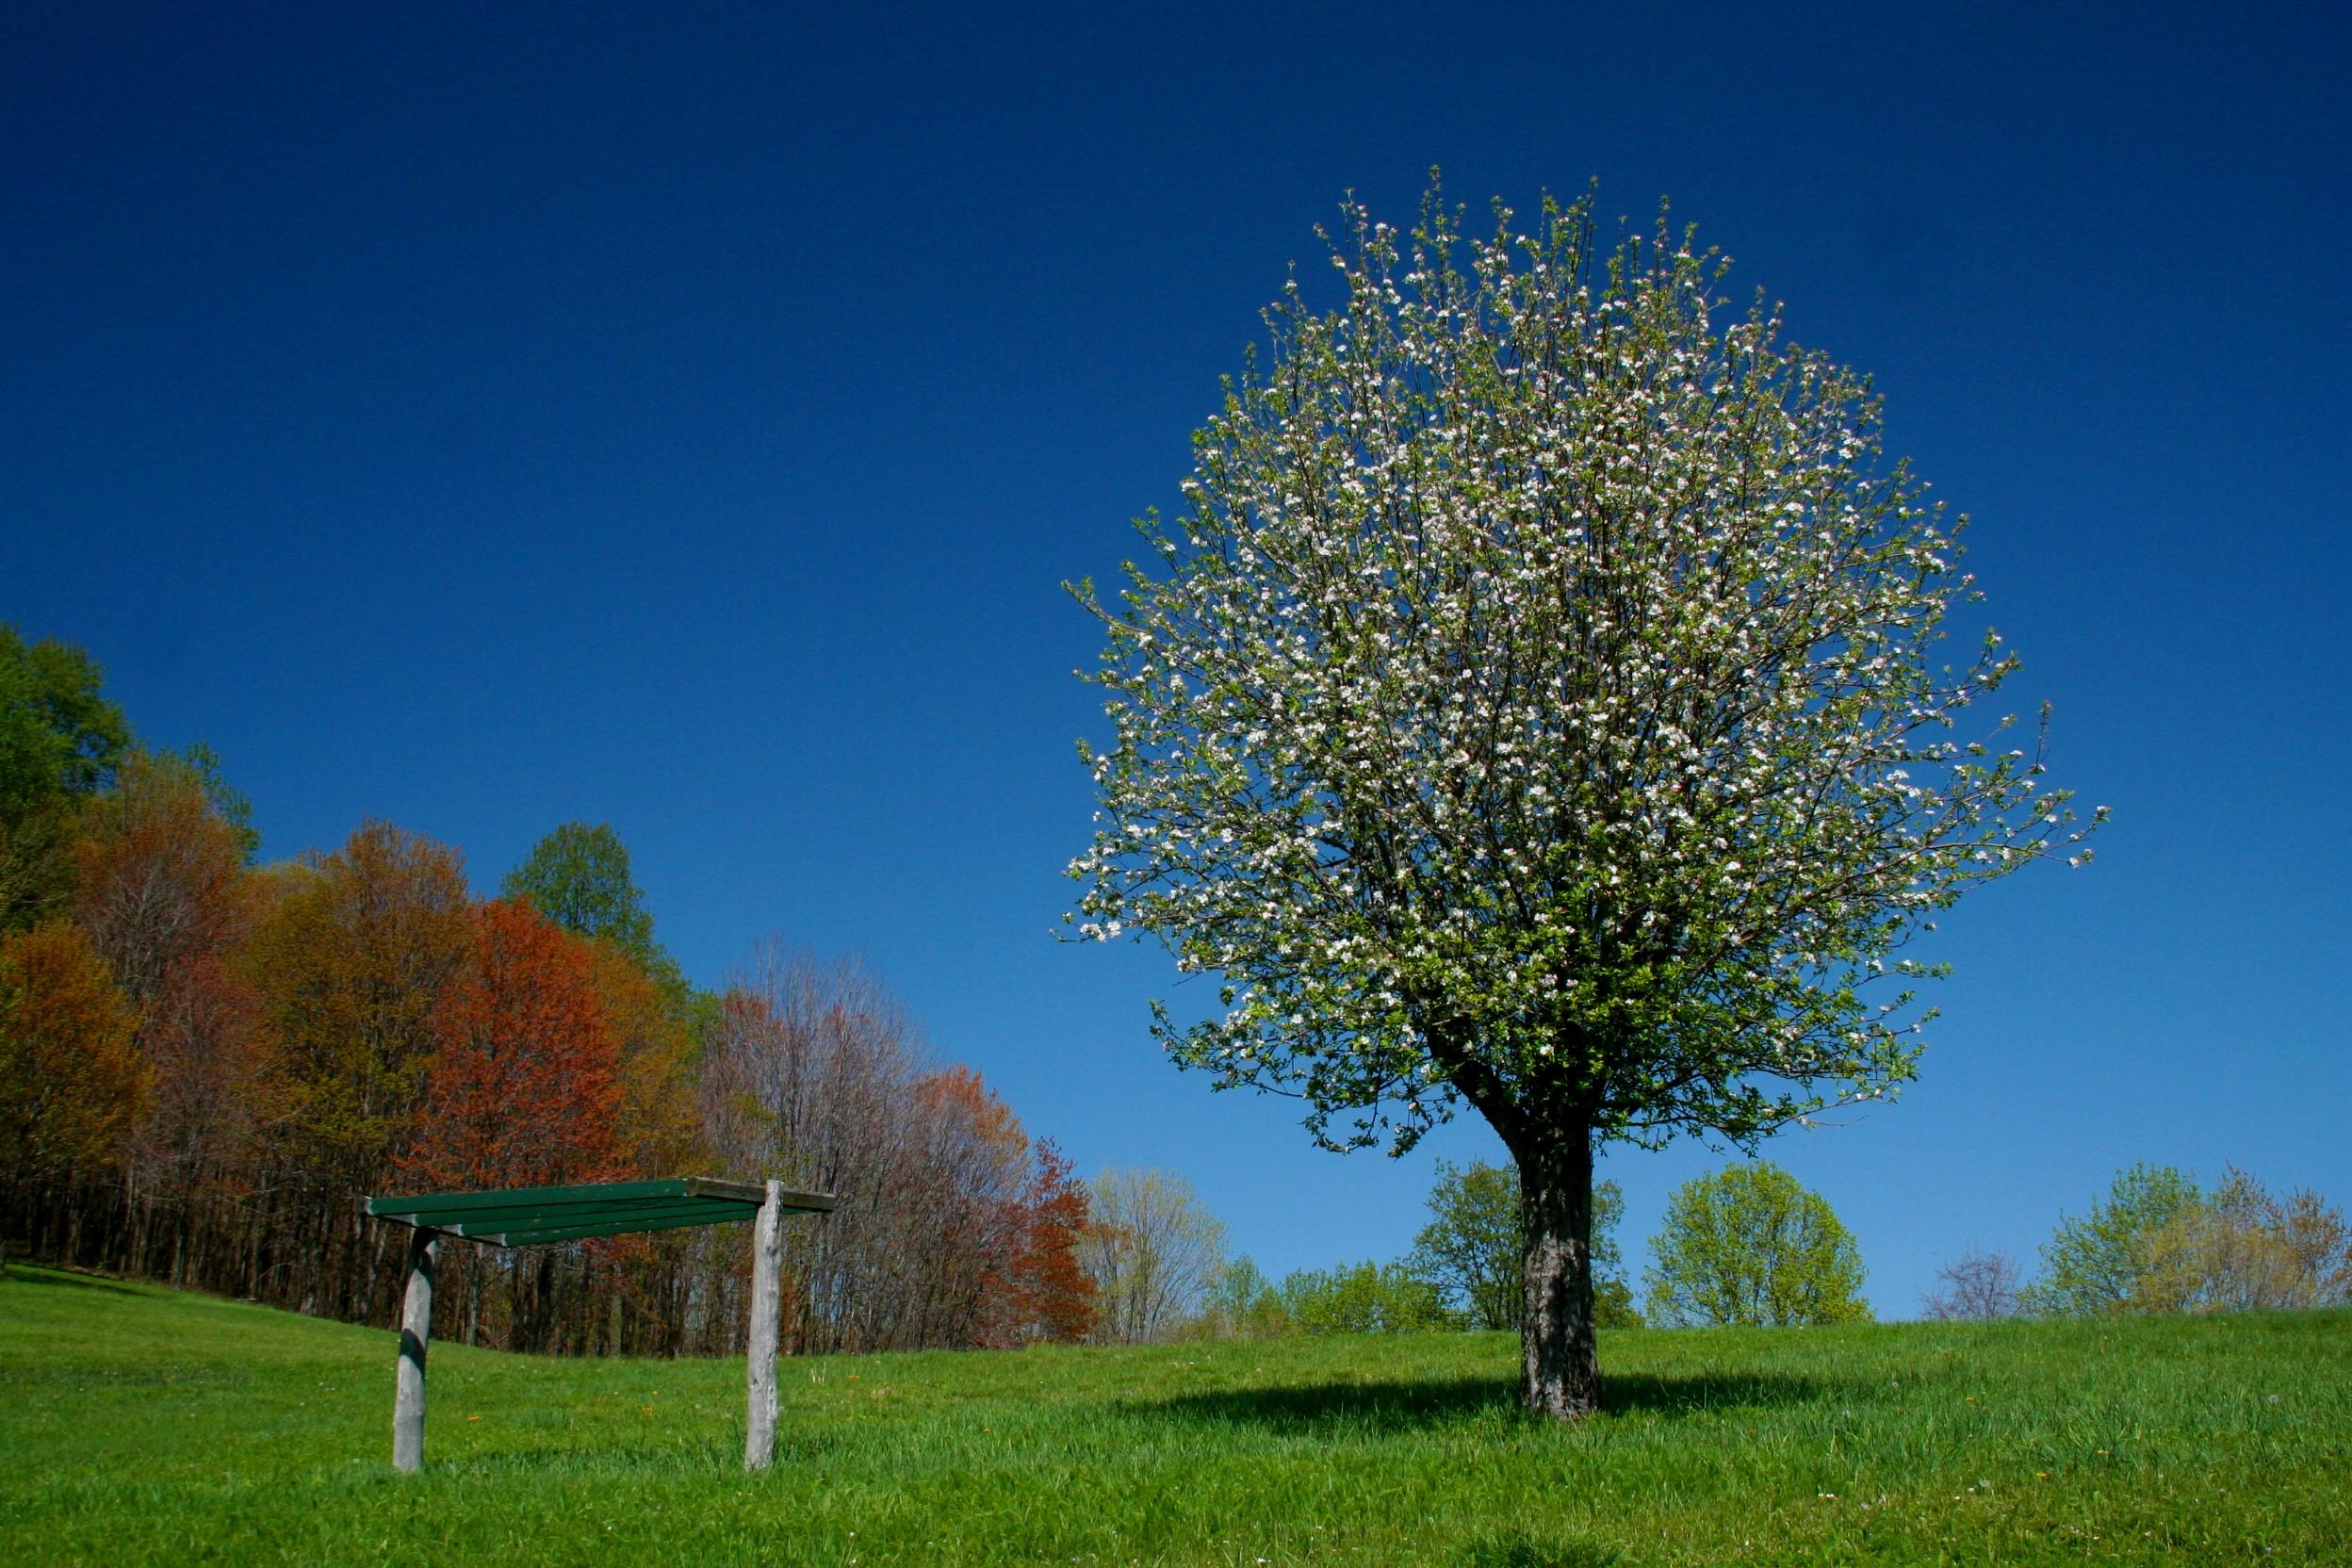 Apple Tree Blooming in Field (tb0508) photo - Thomas Bailey photos ...